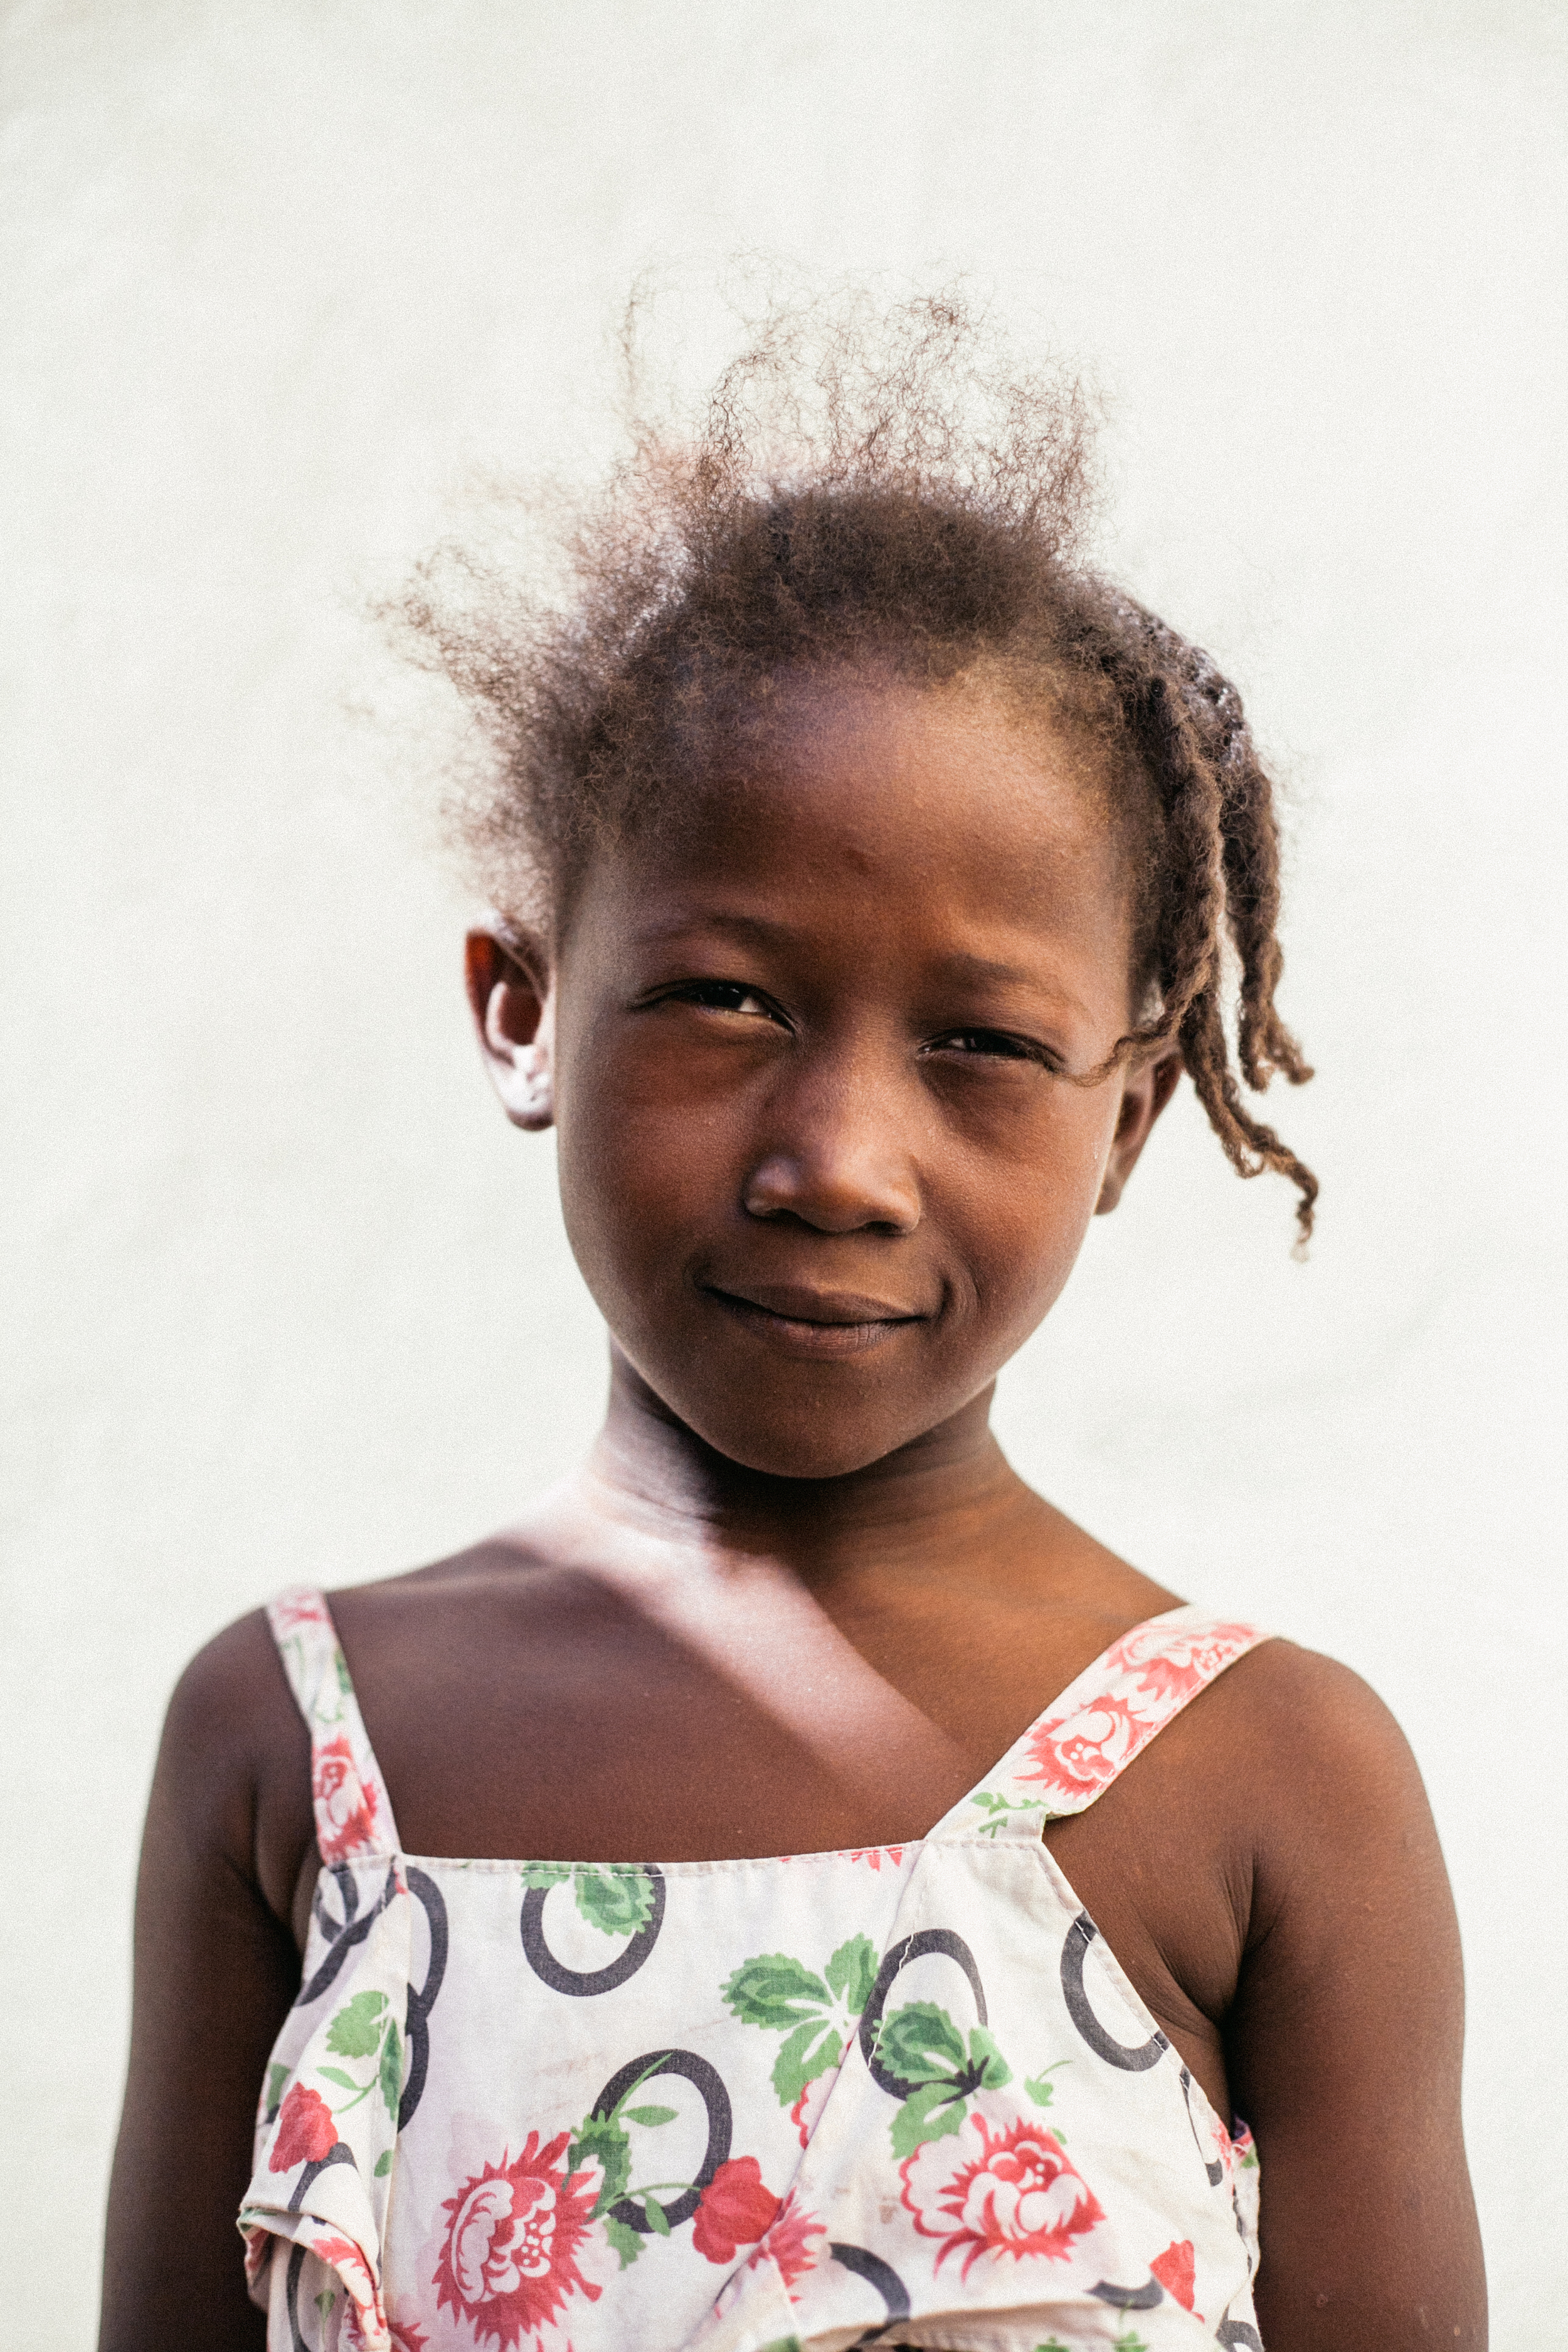 Haiti5starslores148.jpg